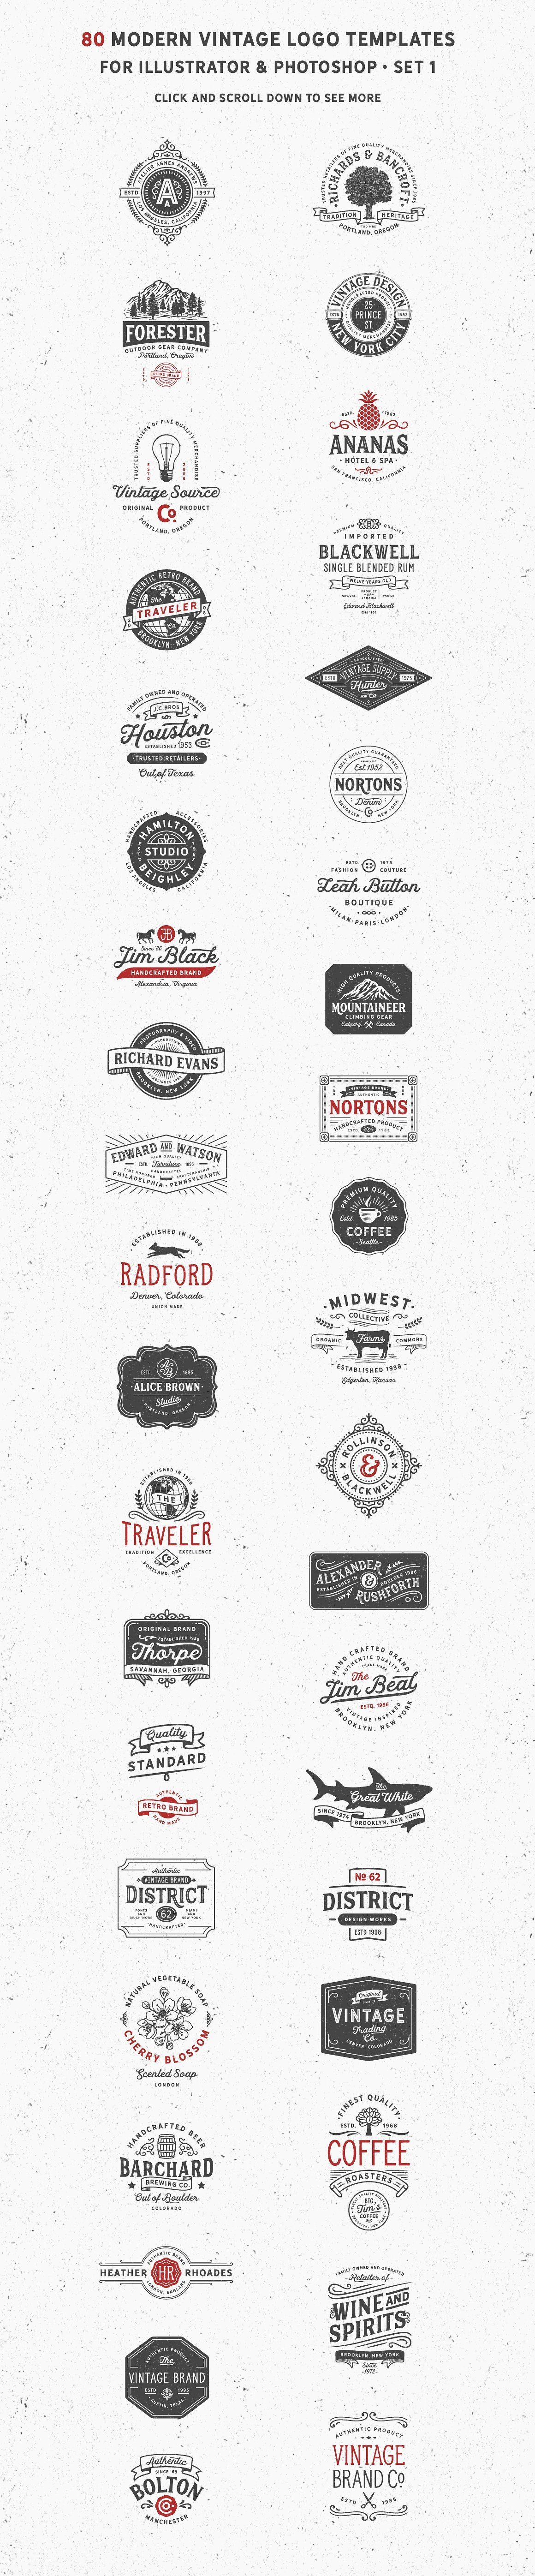 80 Modern Vintage Logos vol 2 by DISTRICT 62 studio on ...